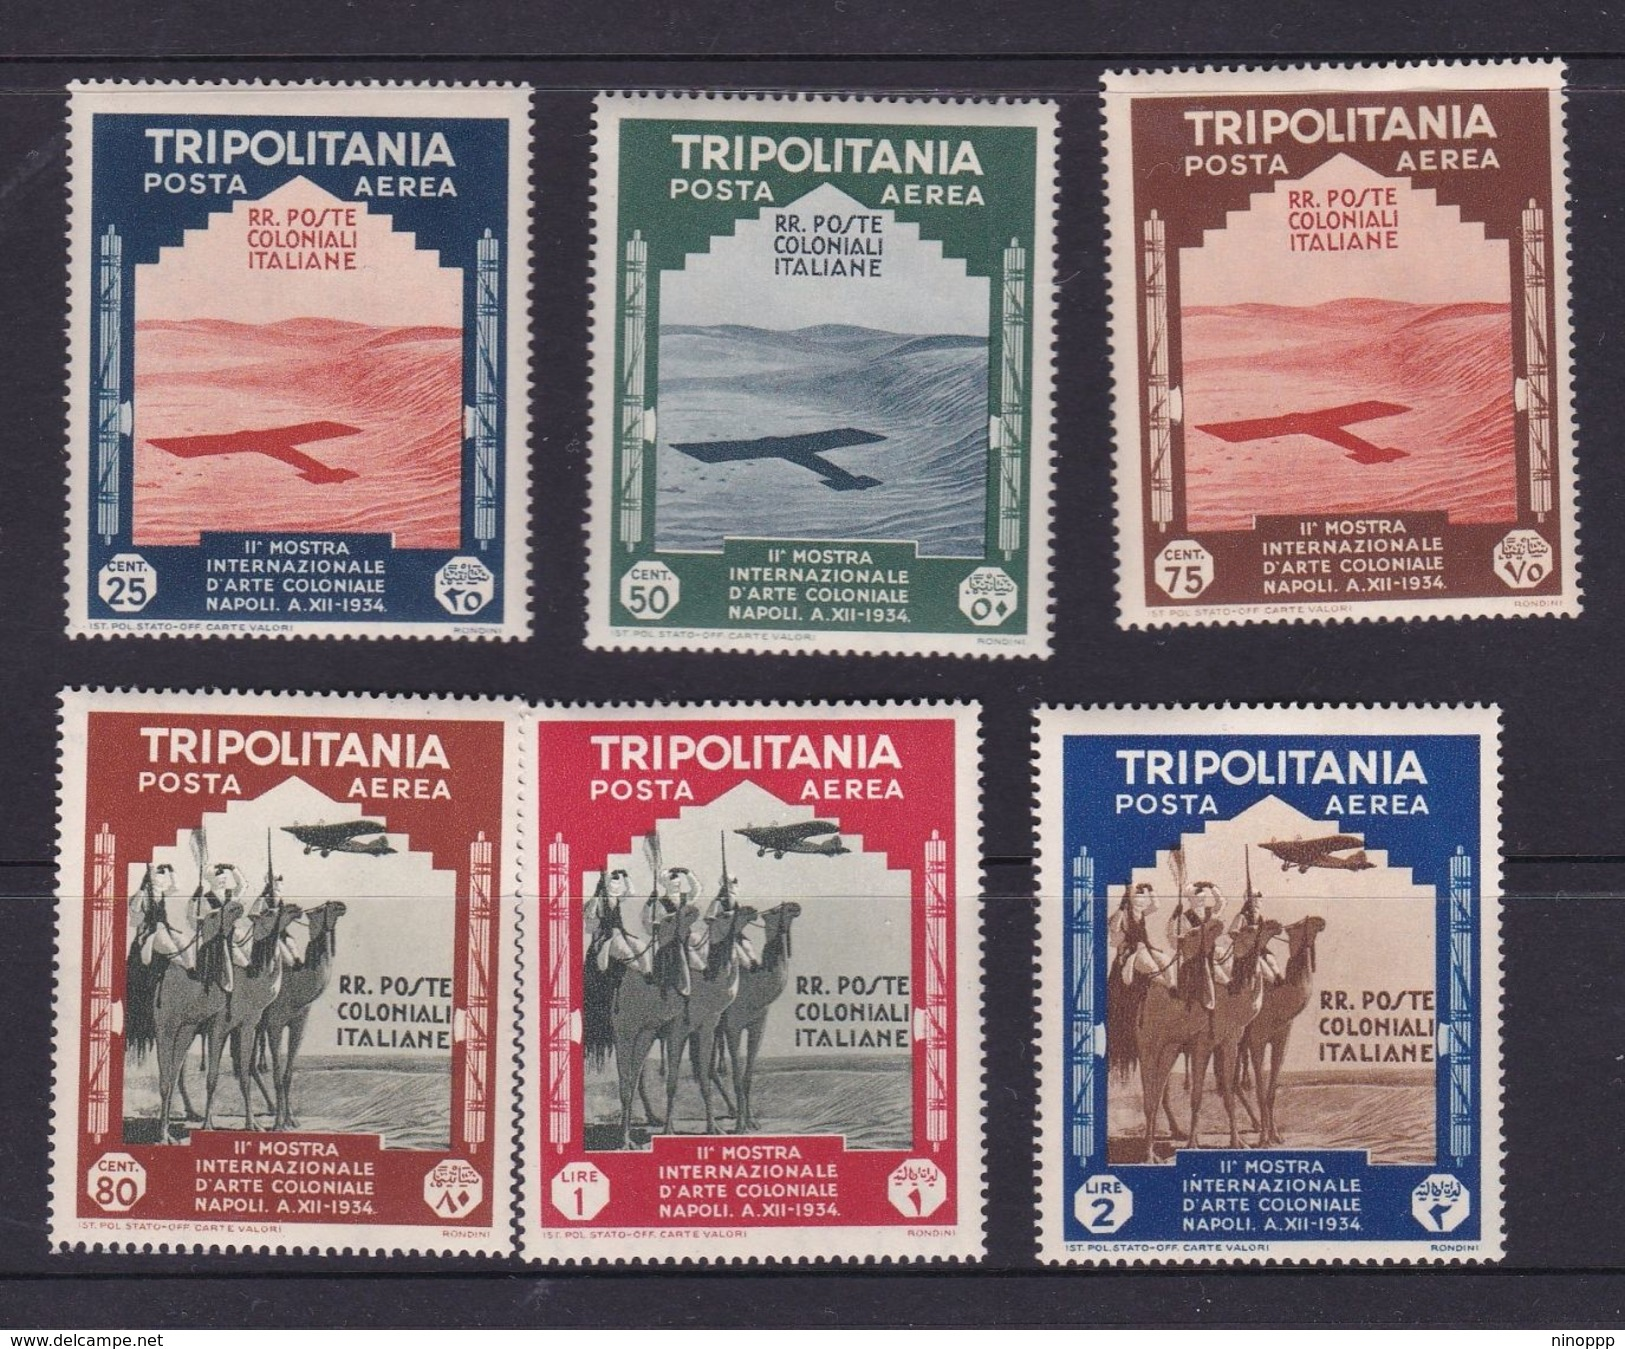 Italy-Colonies And Territories-Tripolitania A 41-46 1934 2nd International Art Fair, Mint Hinged - Tripolitania